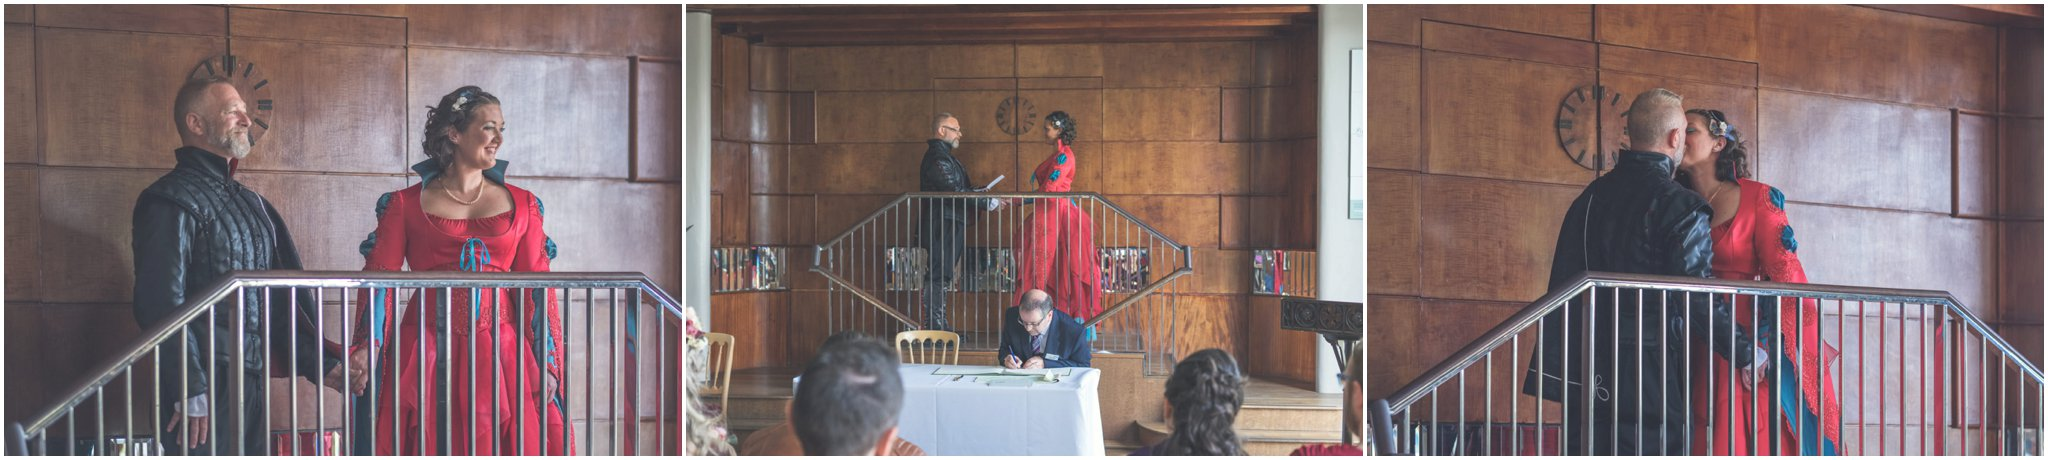 Stratford-Upon-Avon-Wedding - Robin Ball Photography-20.jpg